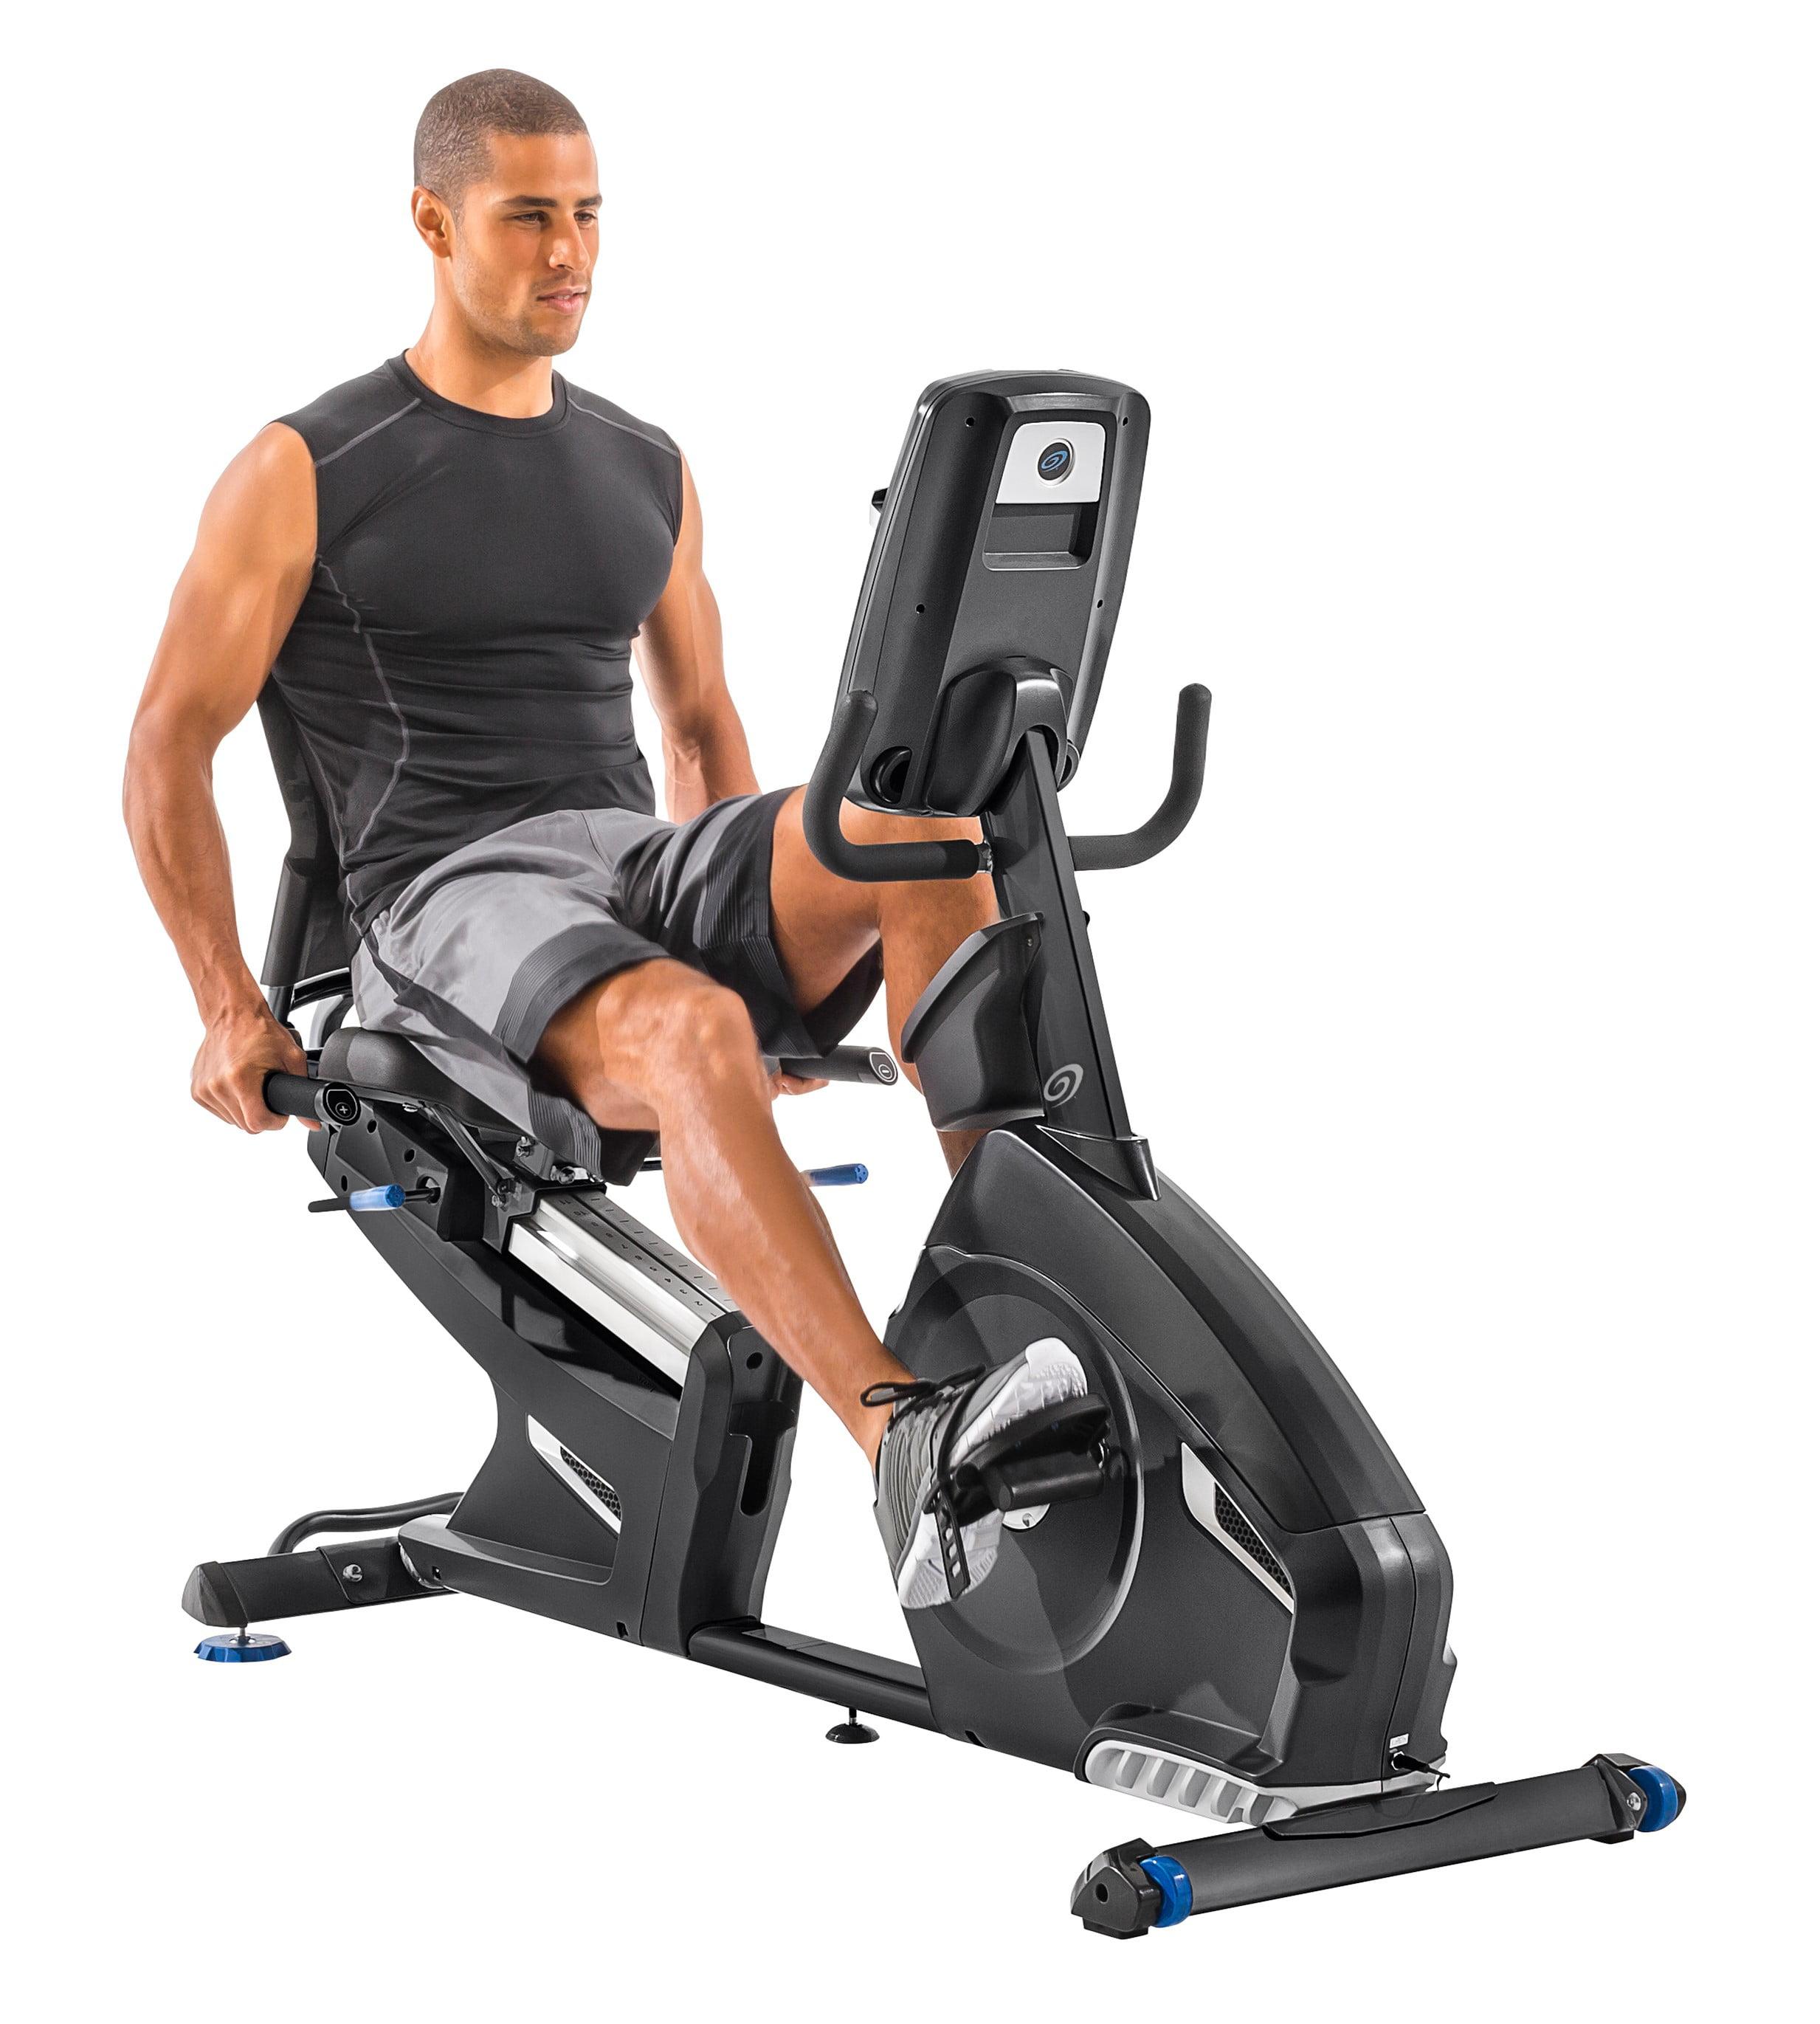 Nautilus R618 Bluetooth Recumbent Bike Syncs with RideSocial & Nautilus Trainer 2 App